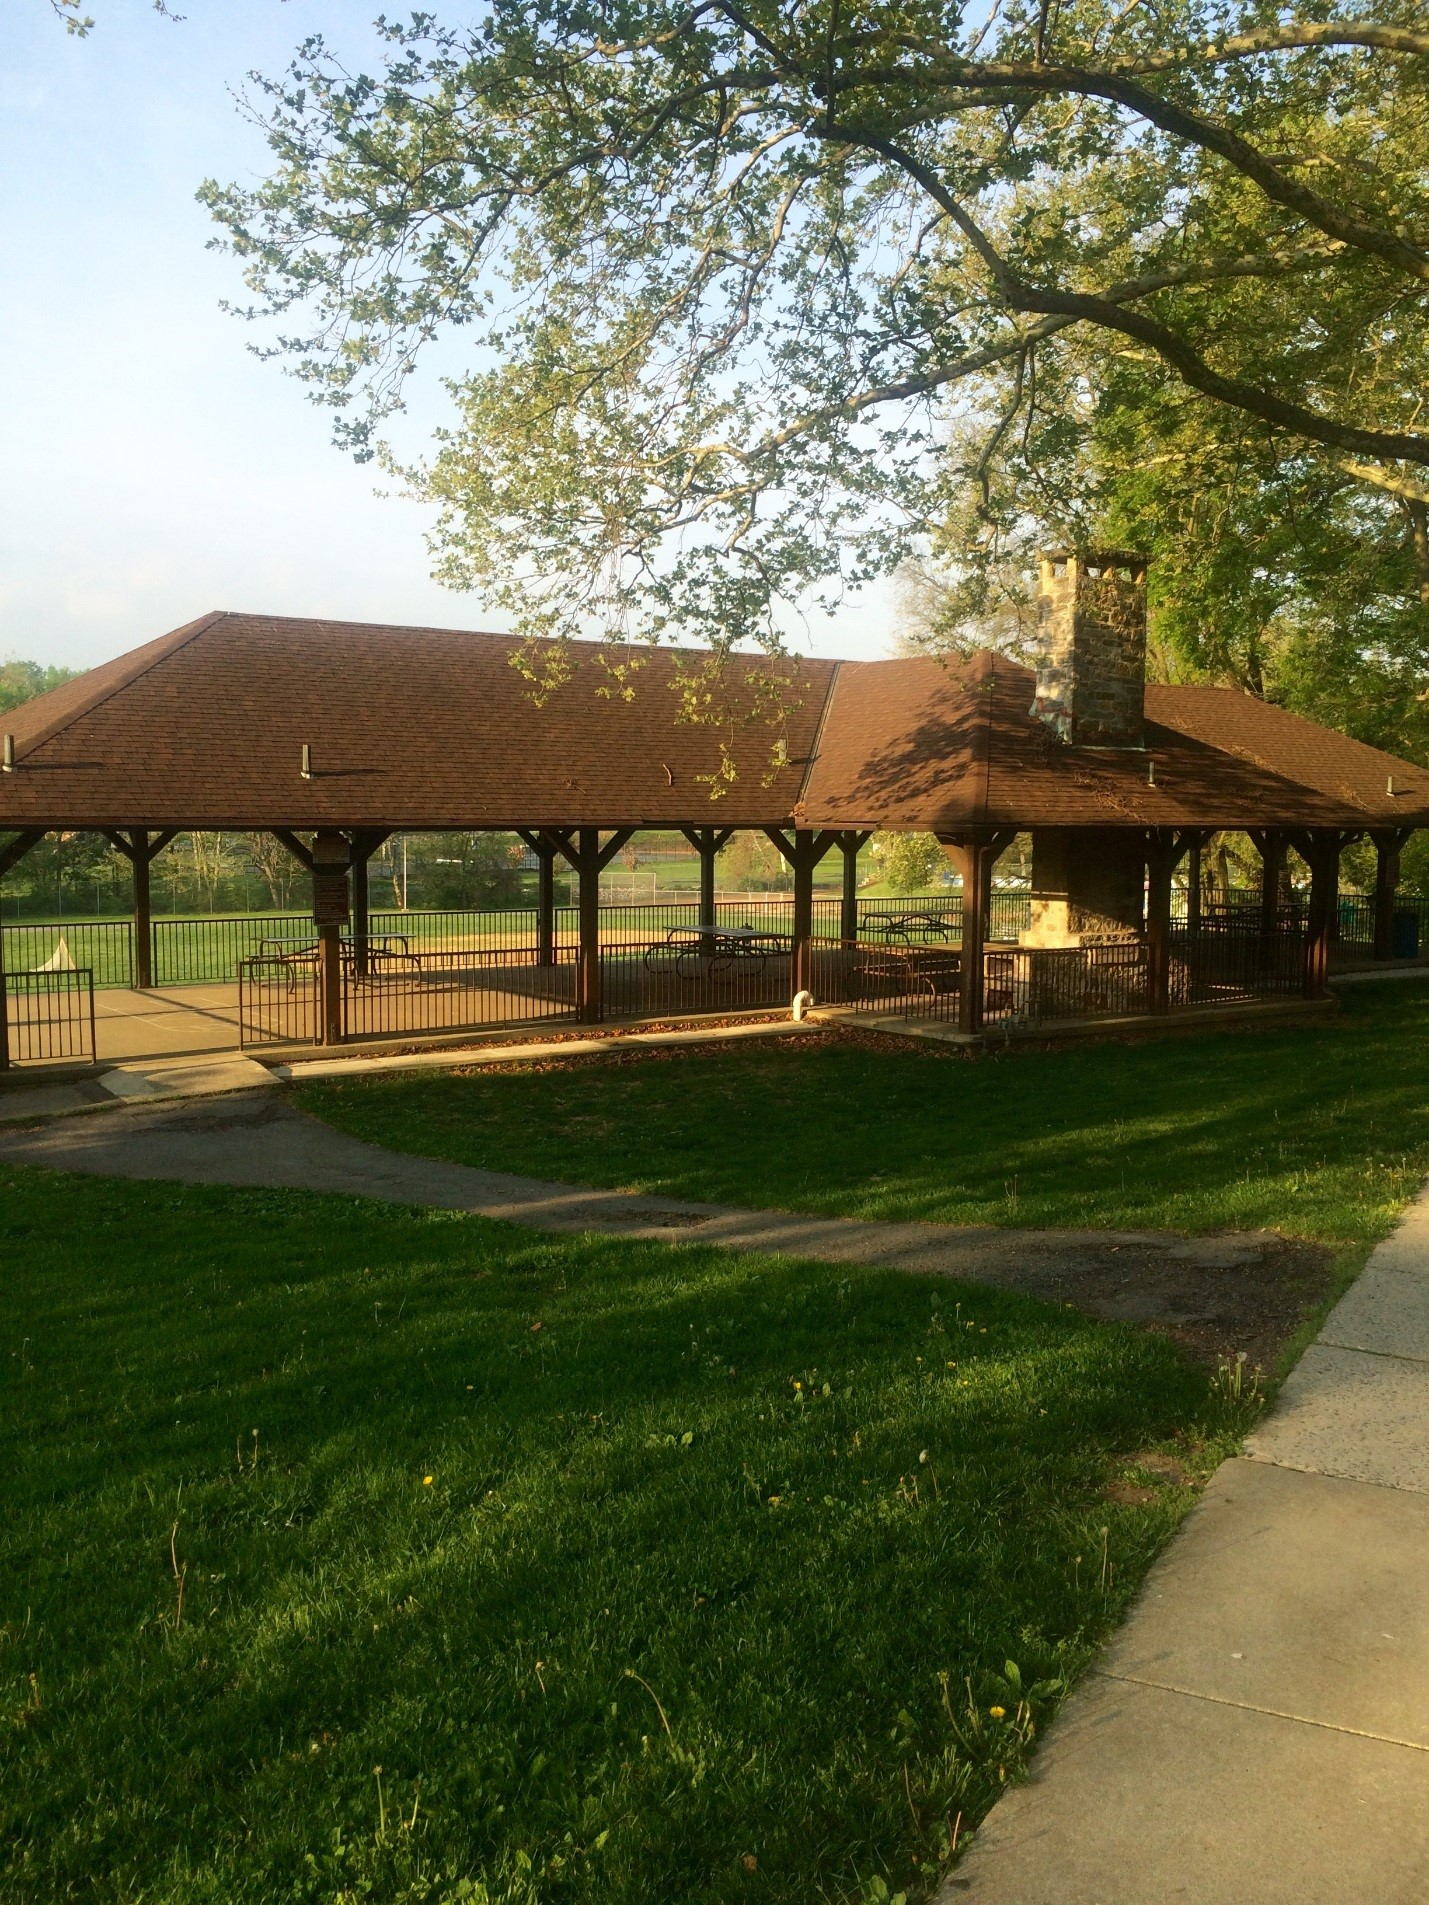 Recreation Facilities - Pavilion